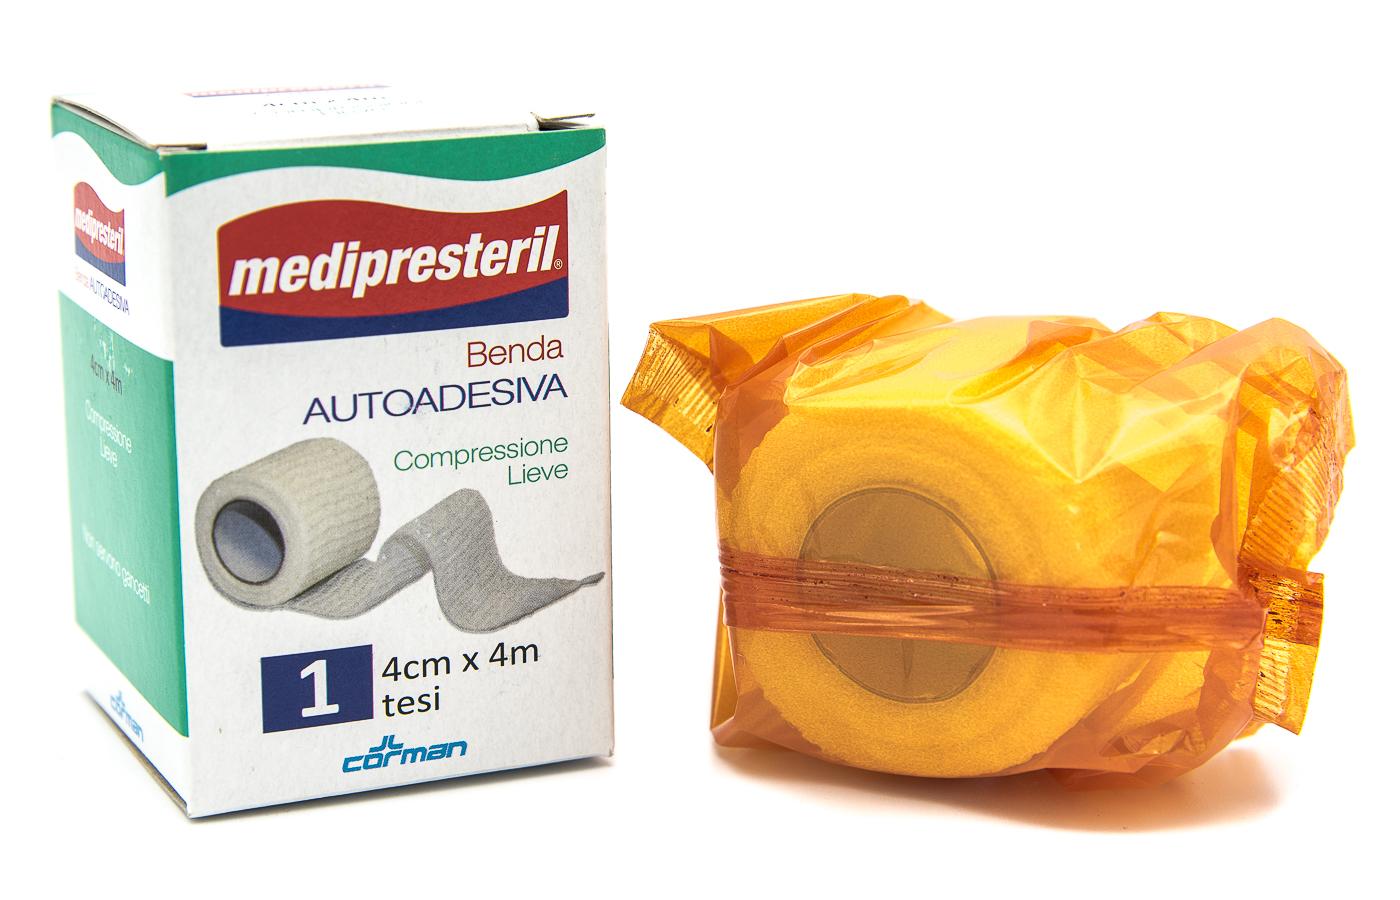 CORMAN SpA Medipresteril Benda Autoadesiva 4cmx4m 1pz